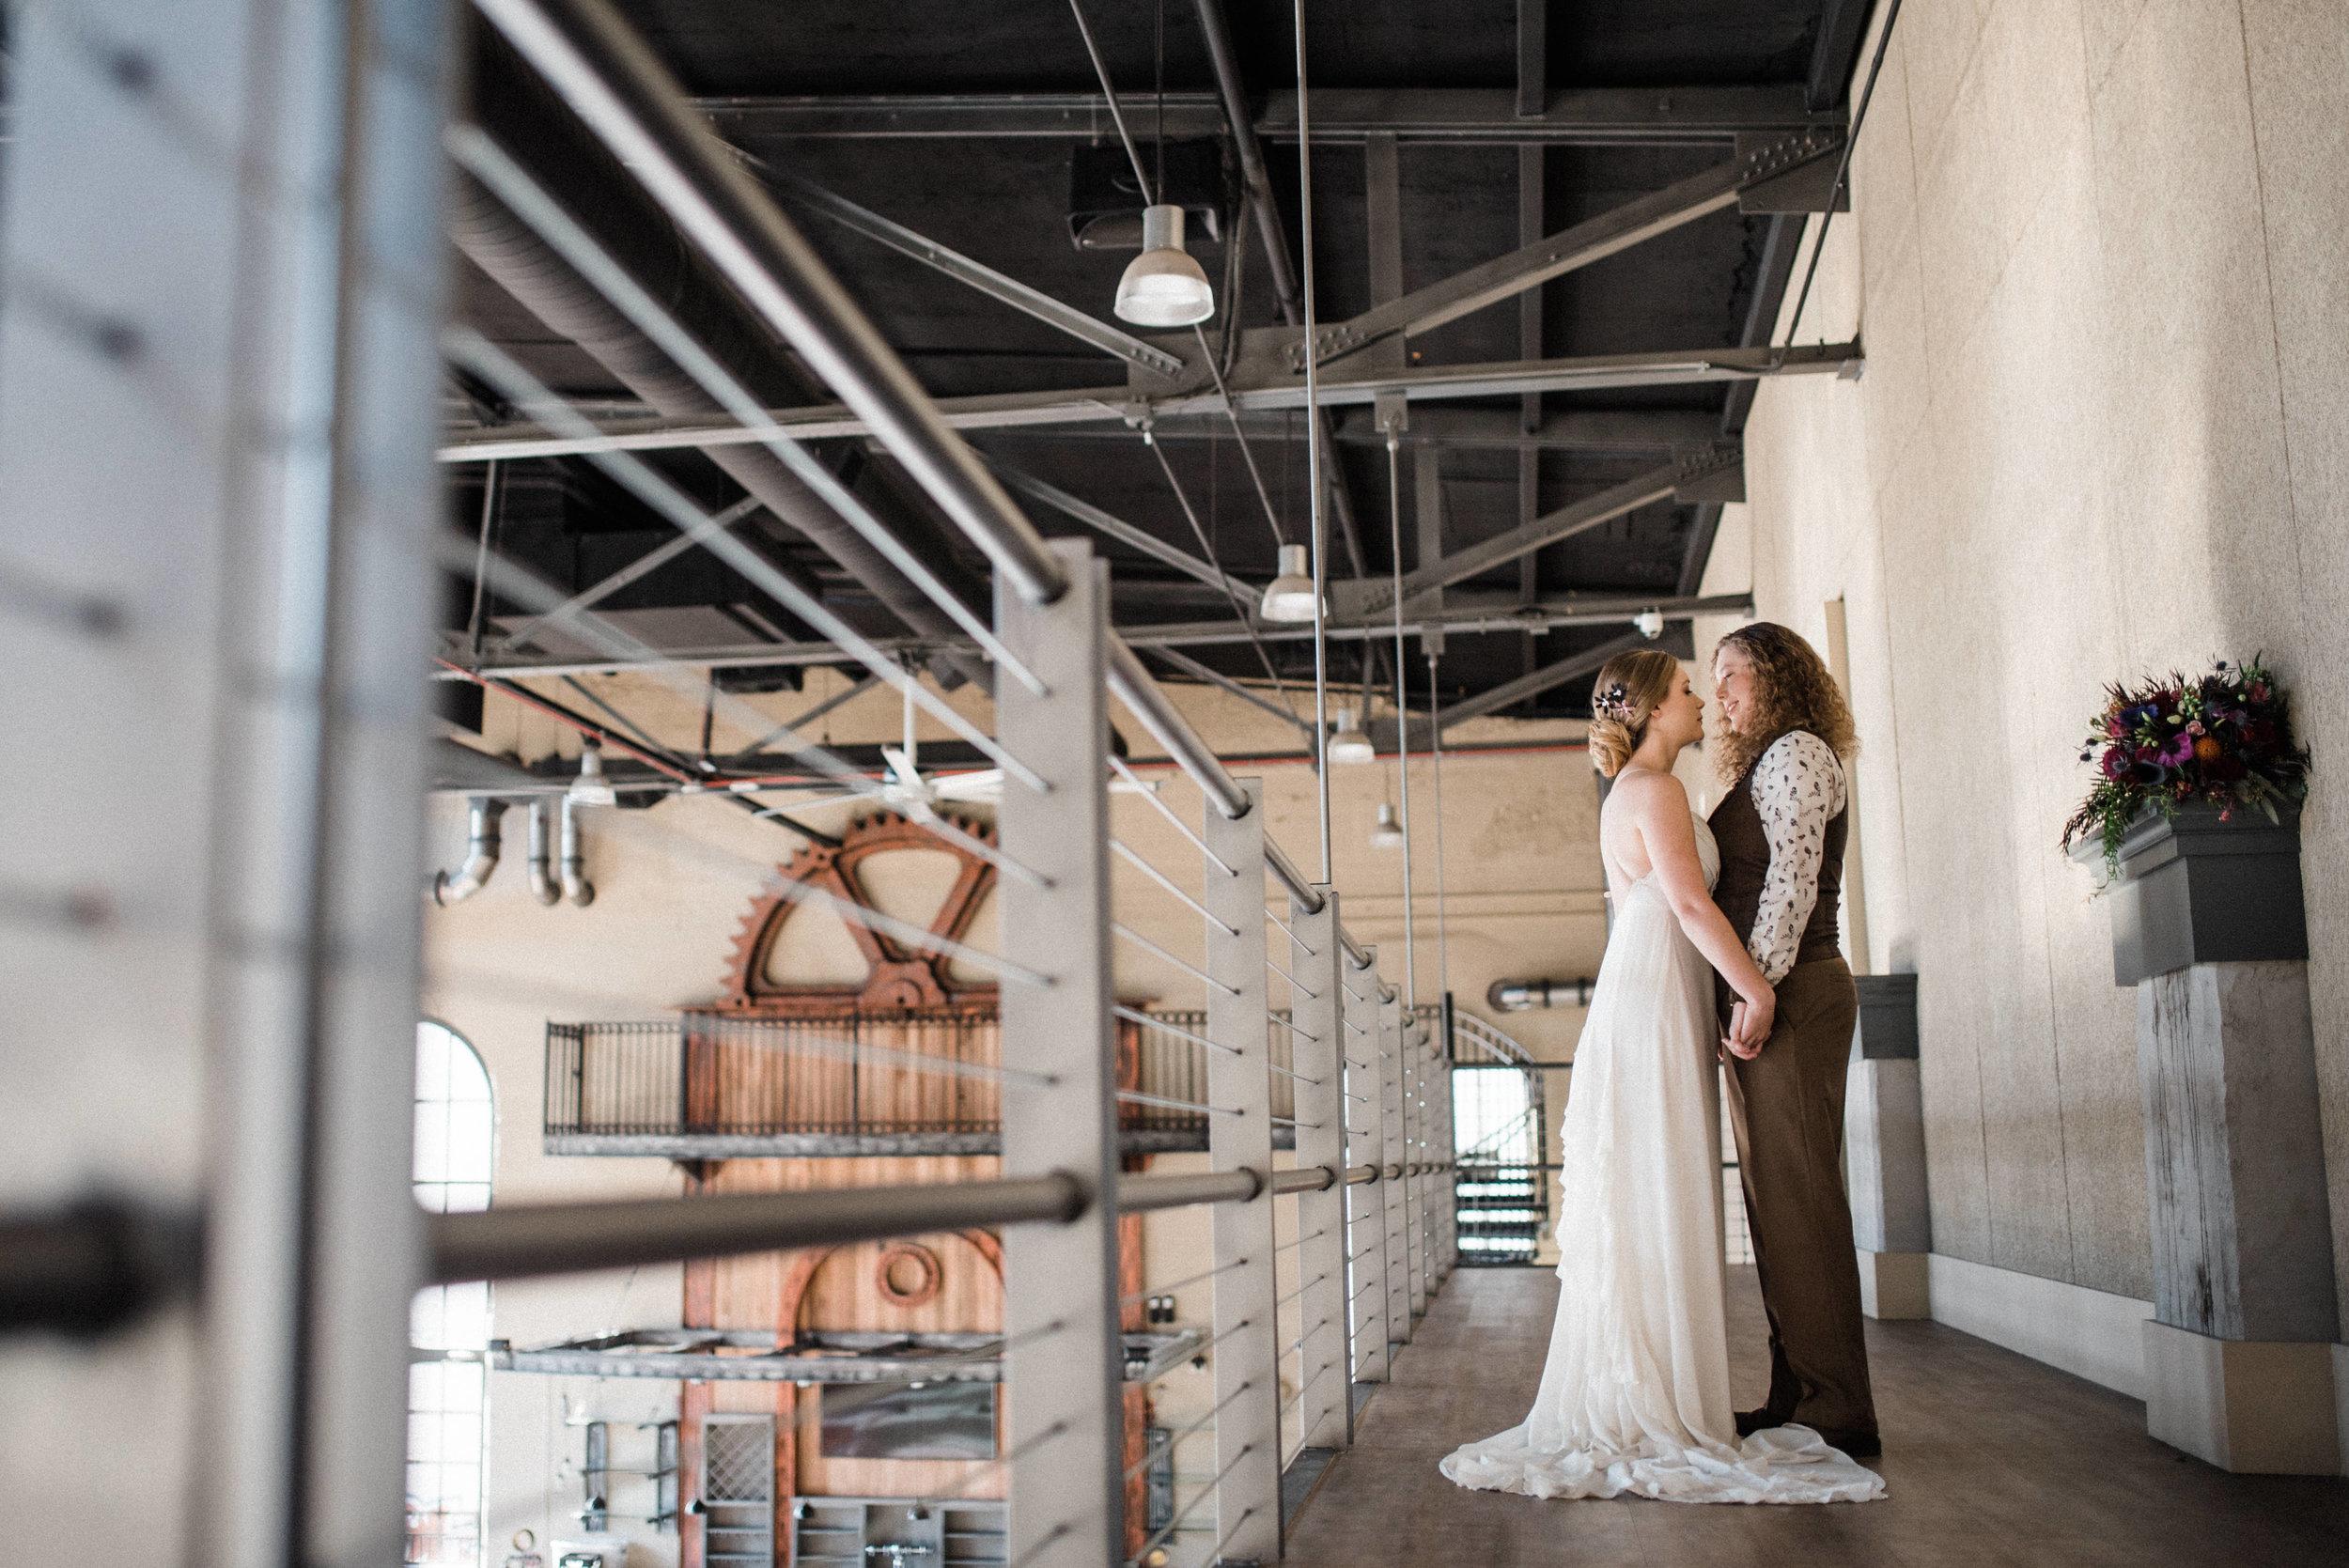 Steam-Plant-StyledShoot-Chelsea-Hall-Photography-Dayton-OH-119.jpg